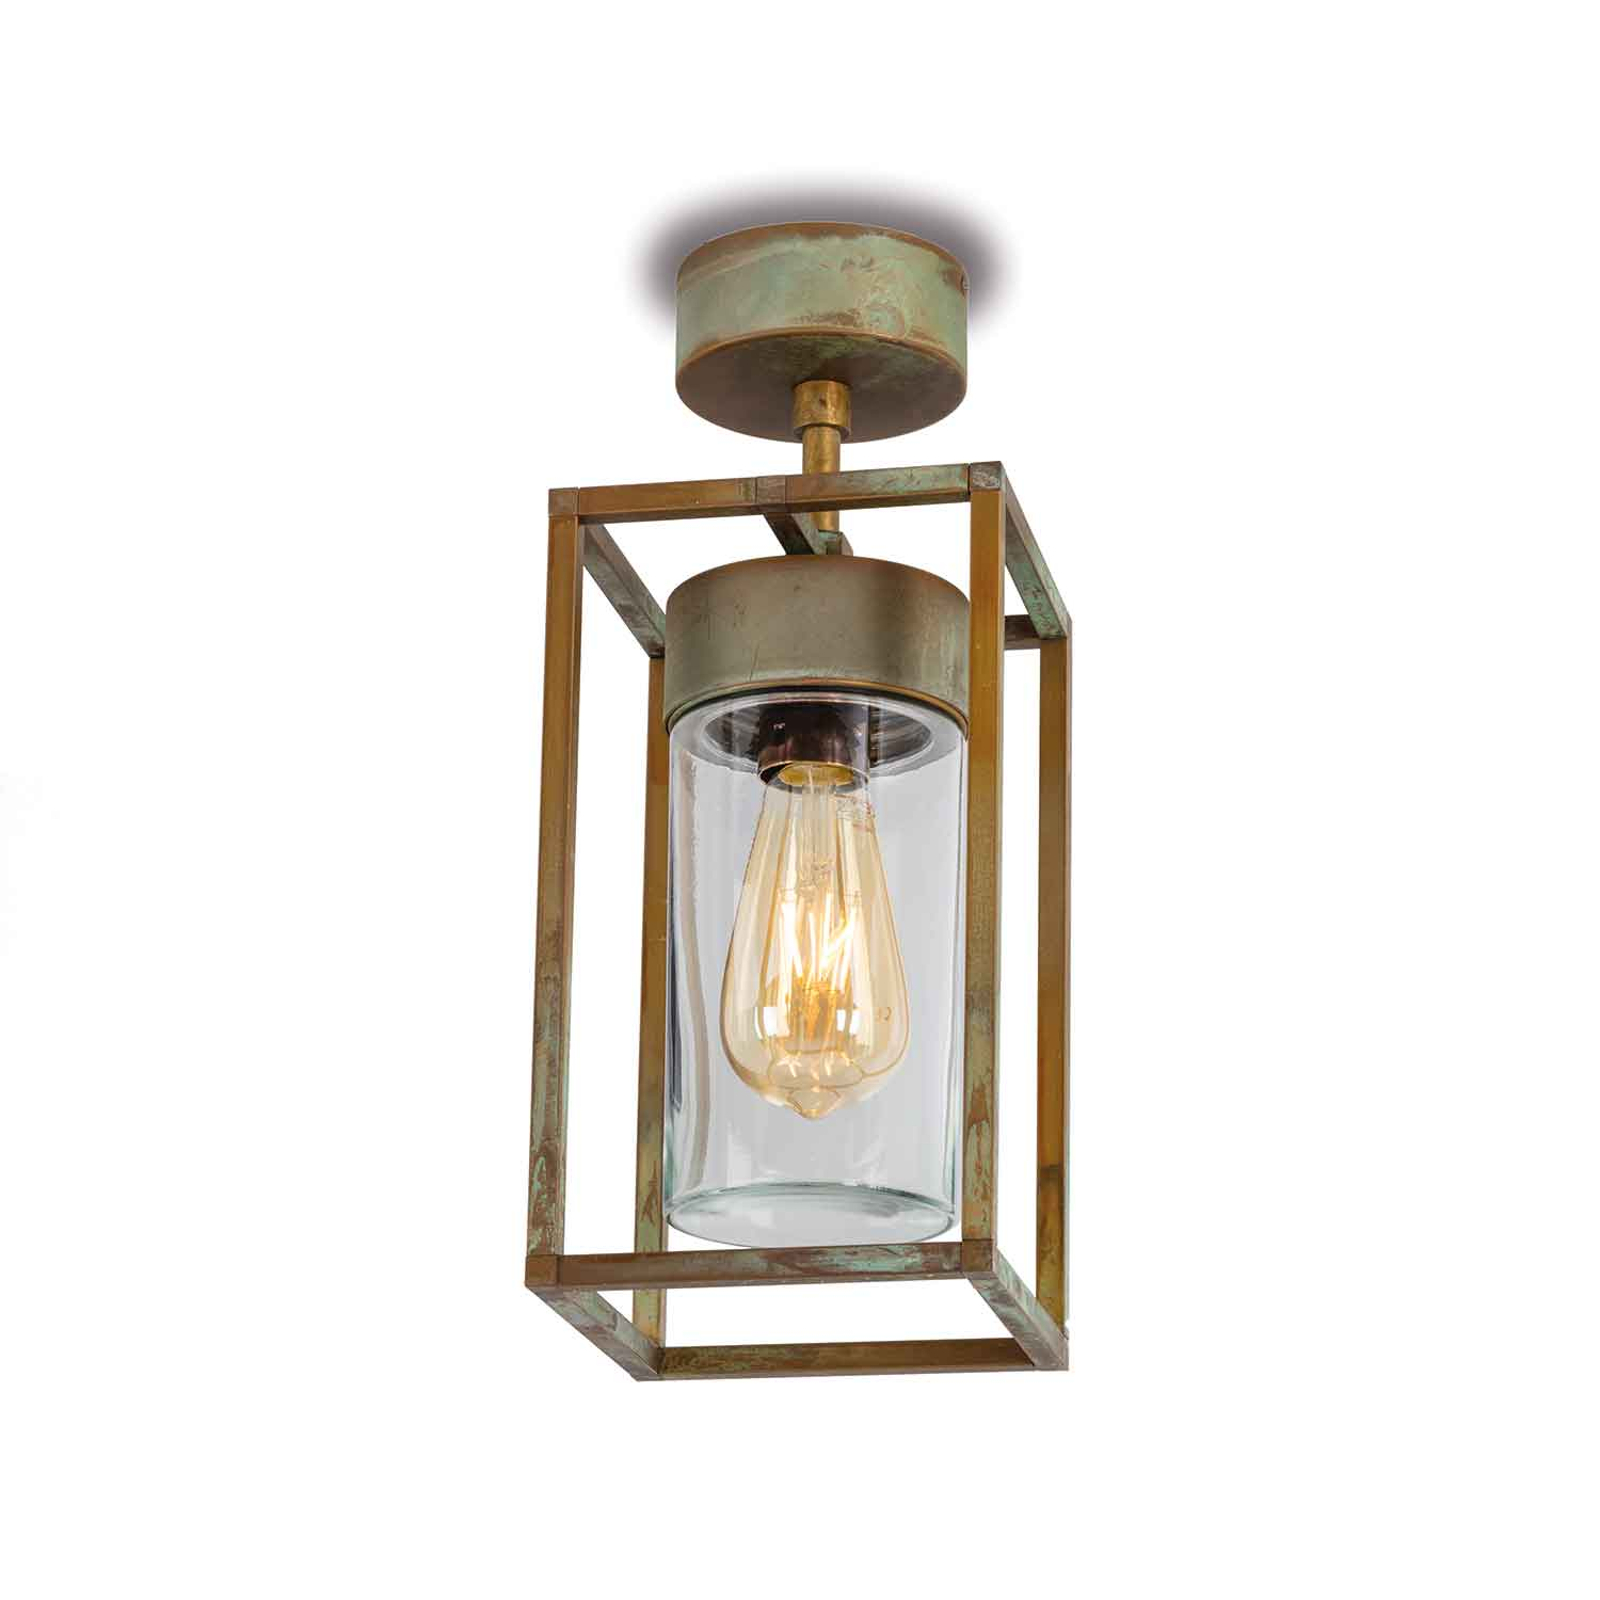 Plafondlamp Cubic³ 3367 messing antiek/helder